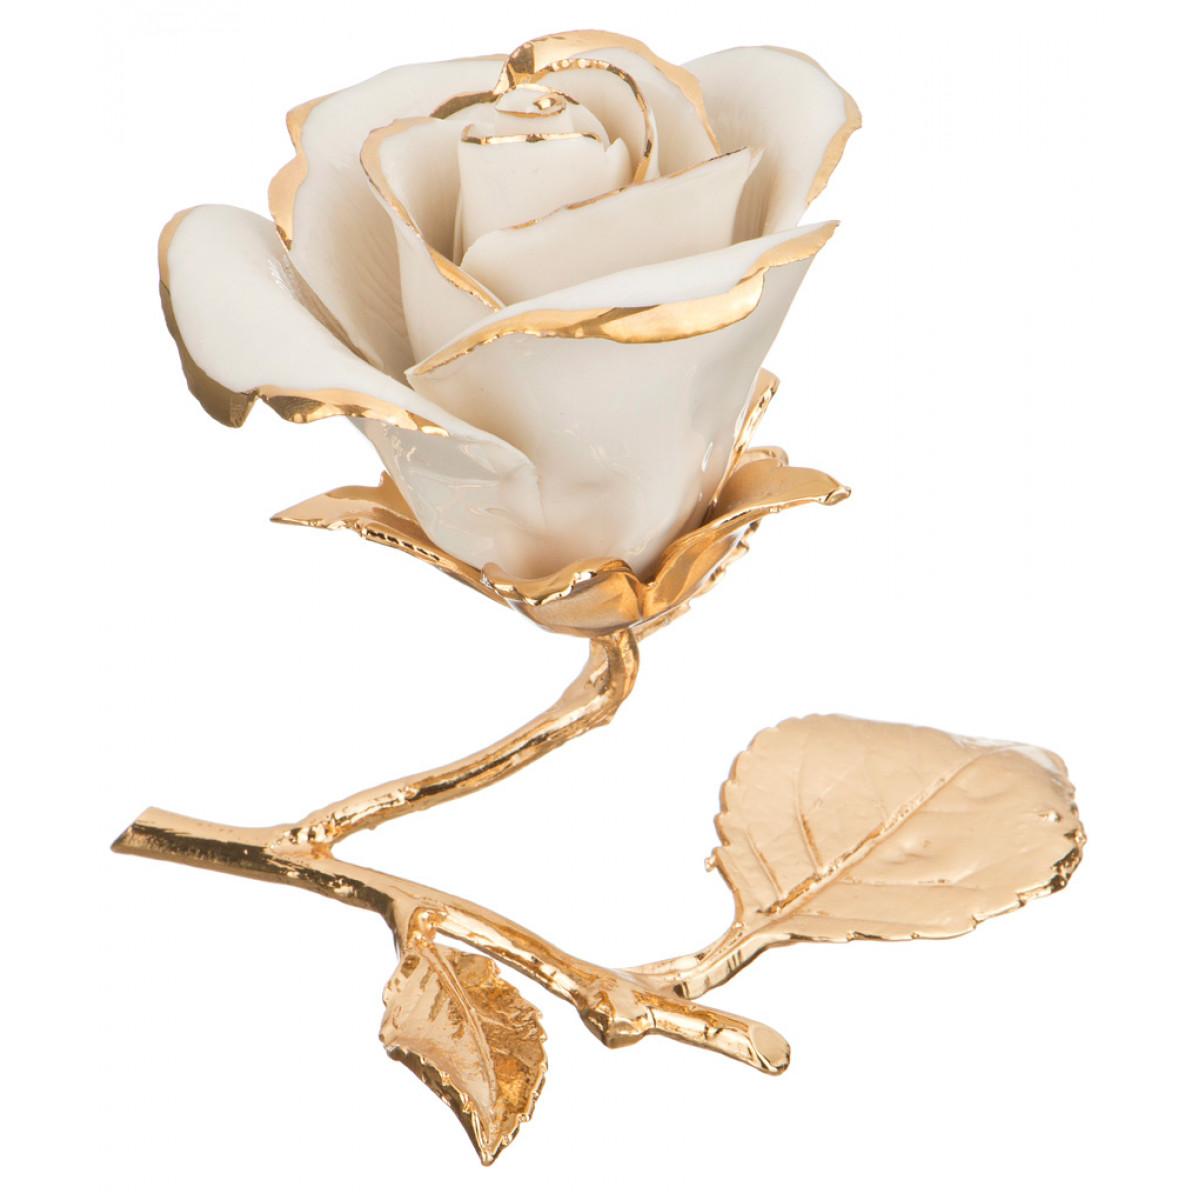 все цены на Искусственные растения Napoleon Искусственный цветок Marlen (8х8х10 см) онлайн